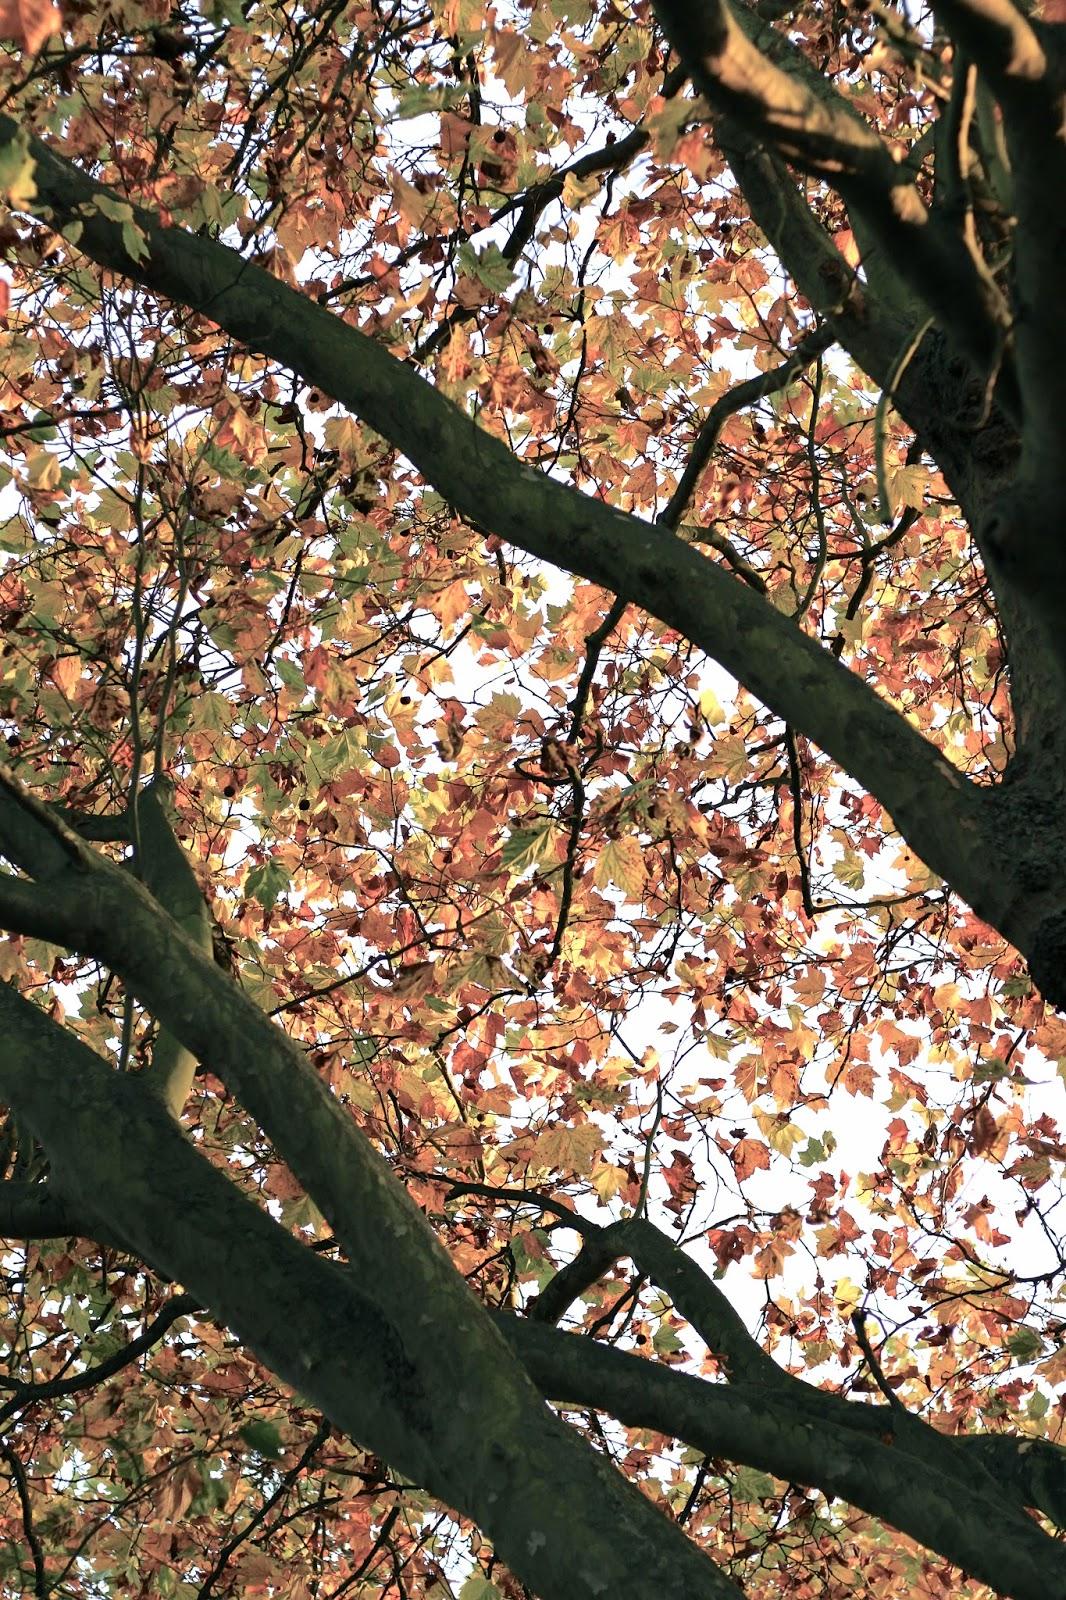 Autumn orange and yellow leaves 2016